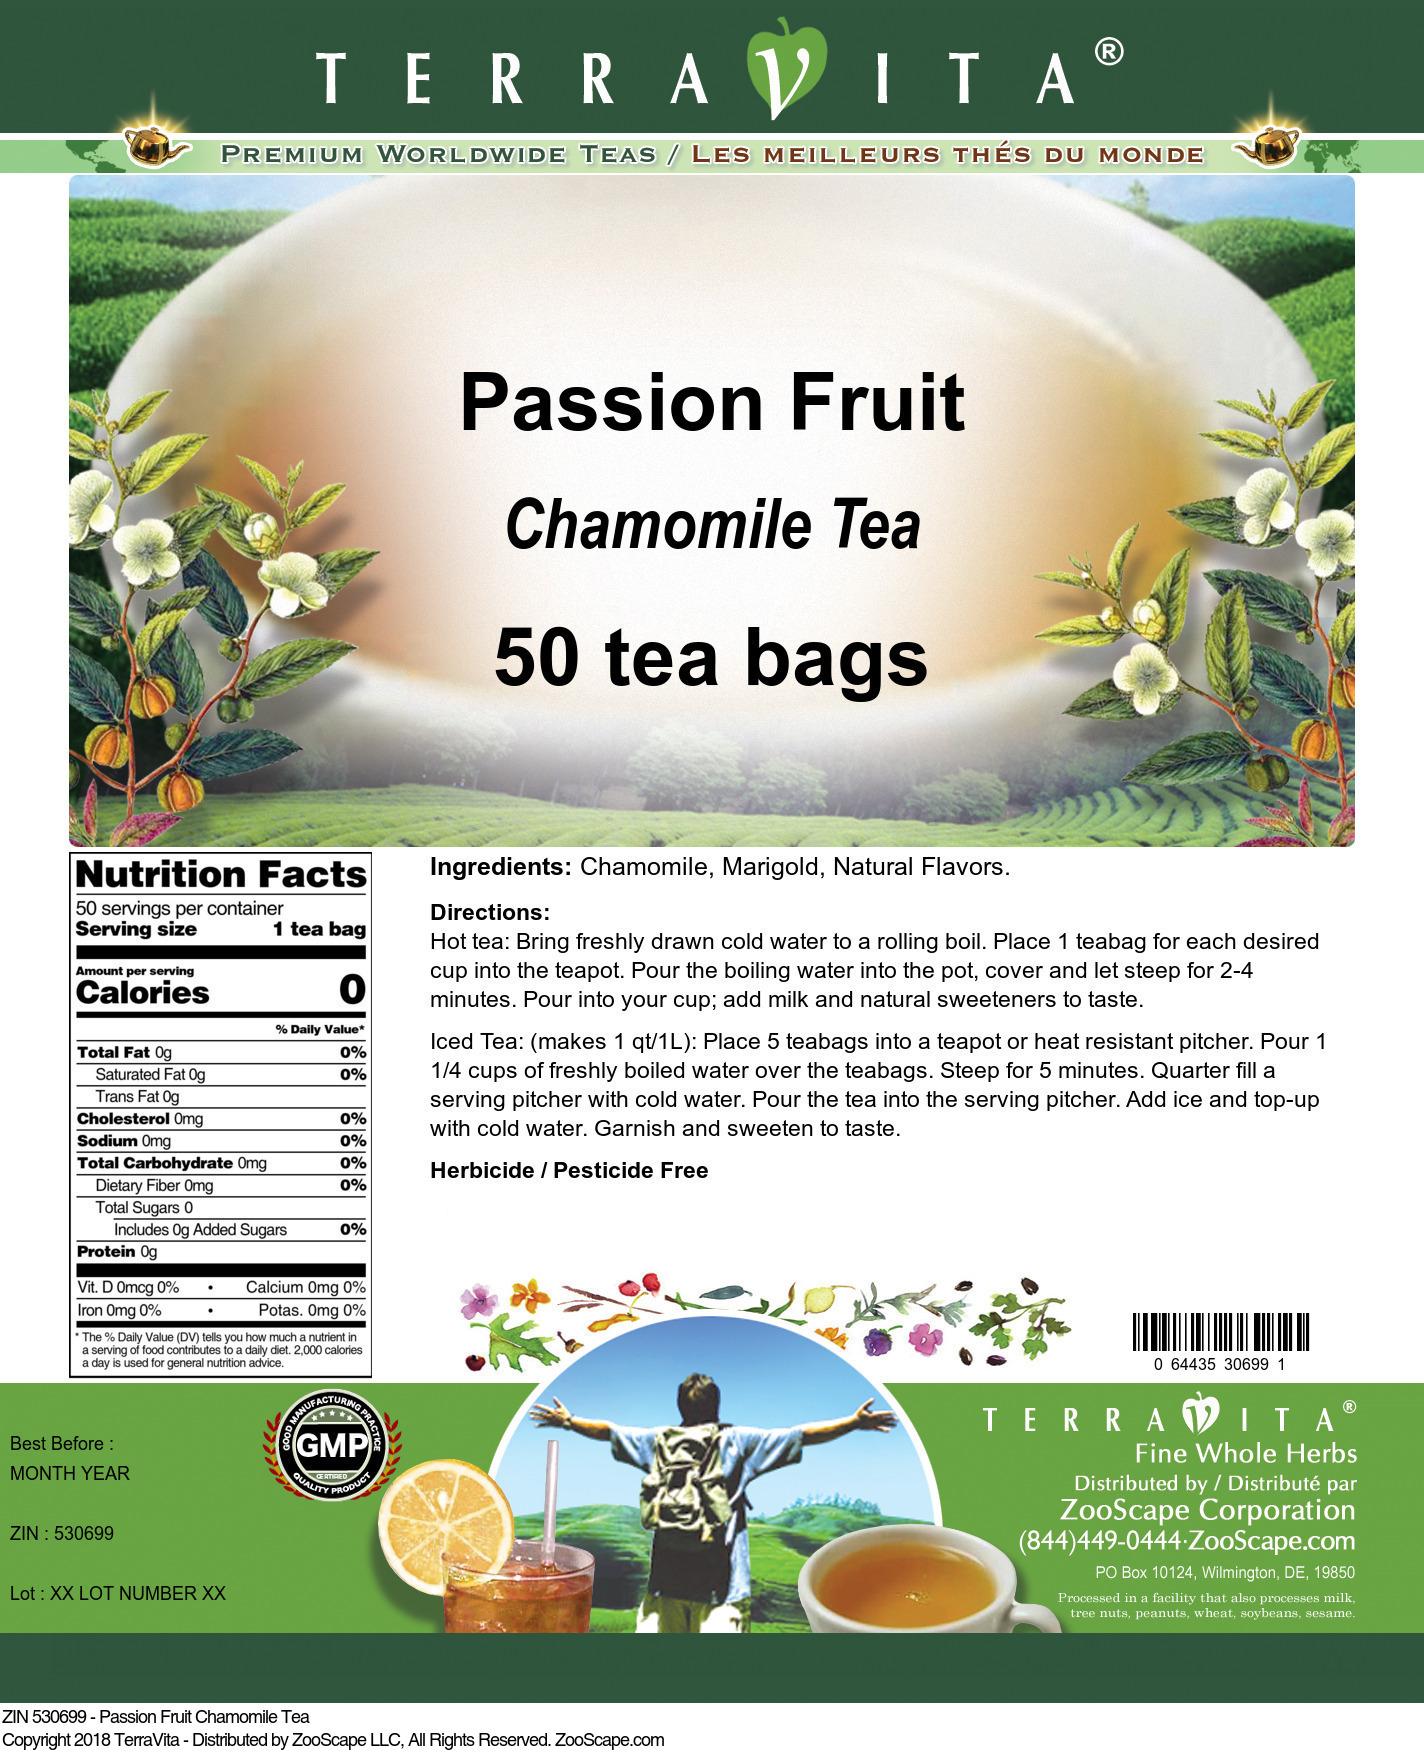 Passion Fruit Chamomile Tea